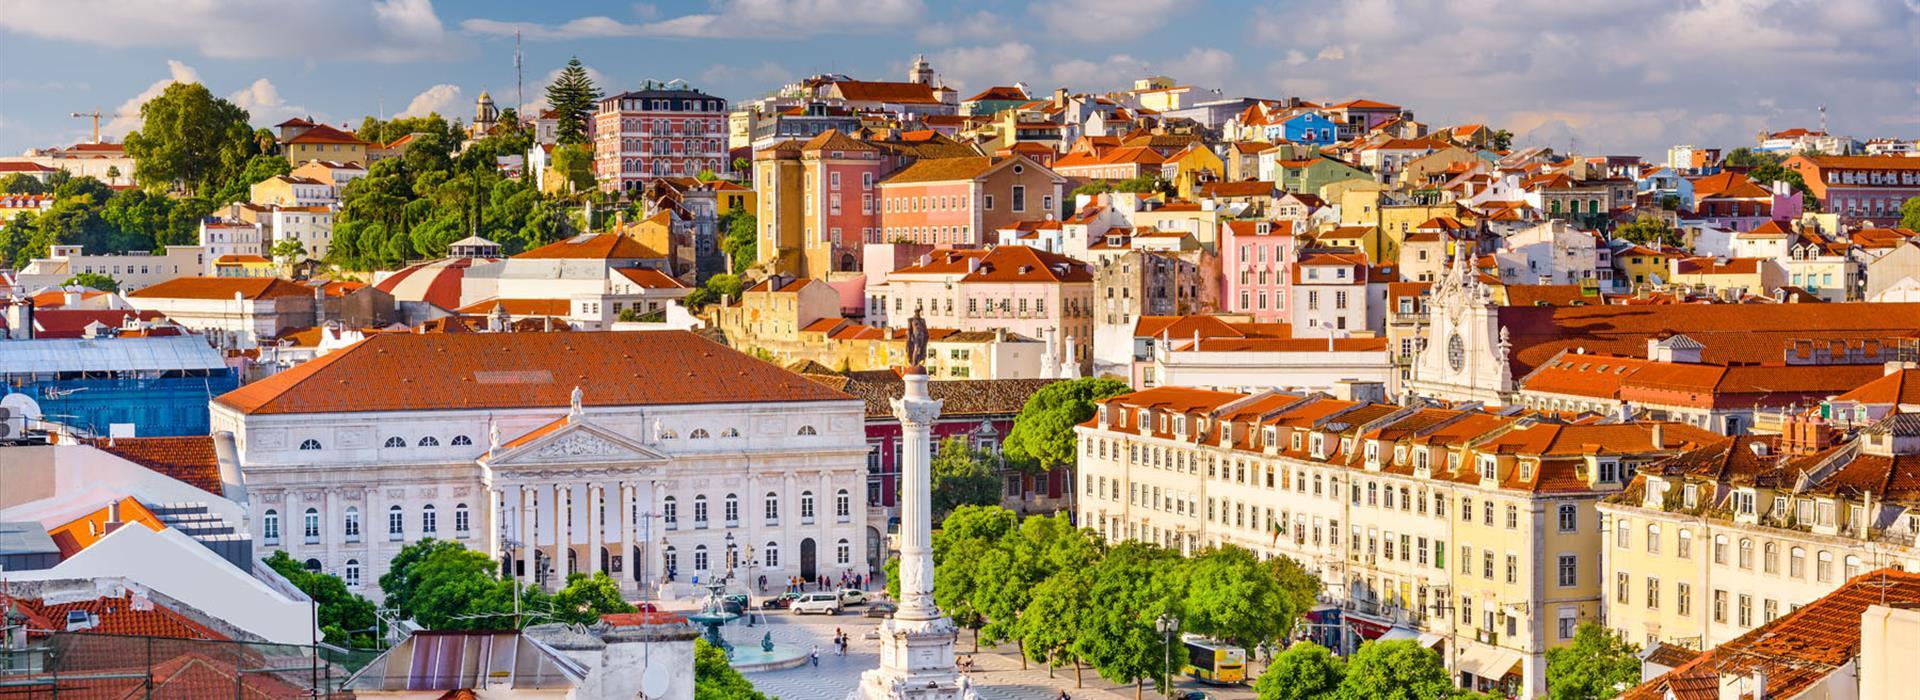 Portugal-Lisbon_292747742